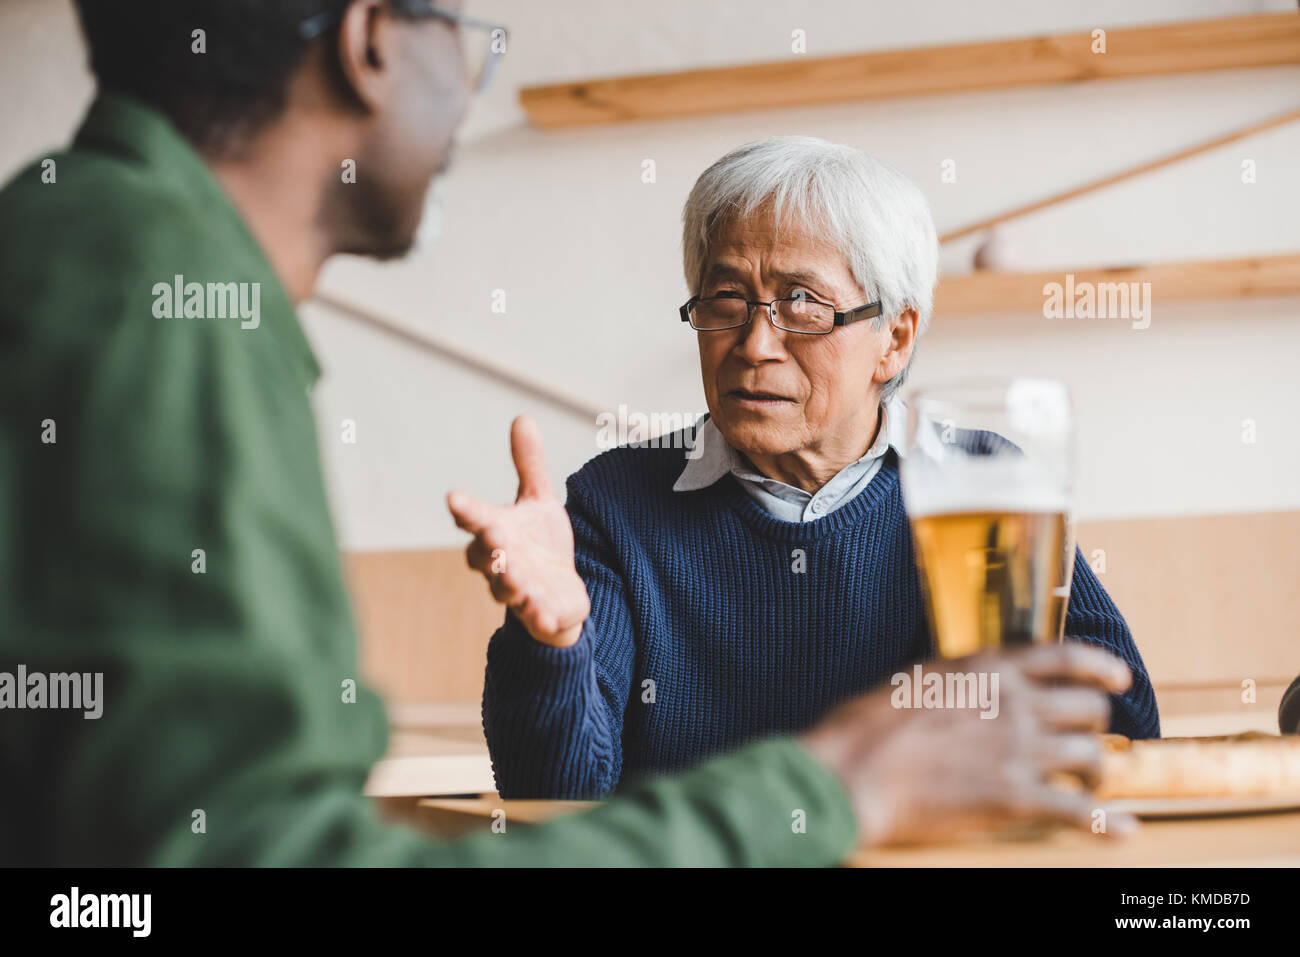 Tener amigos senior discusión en bar Imagen De Stock